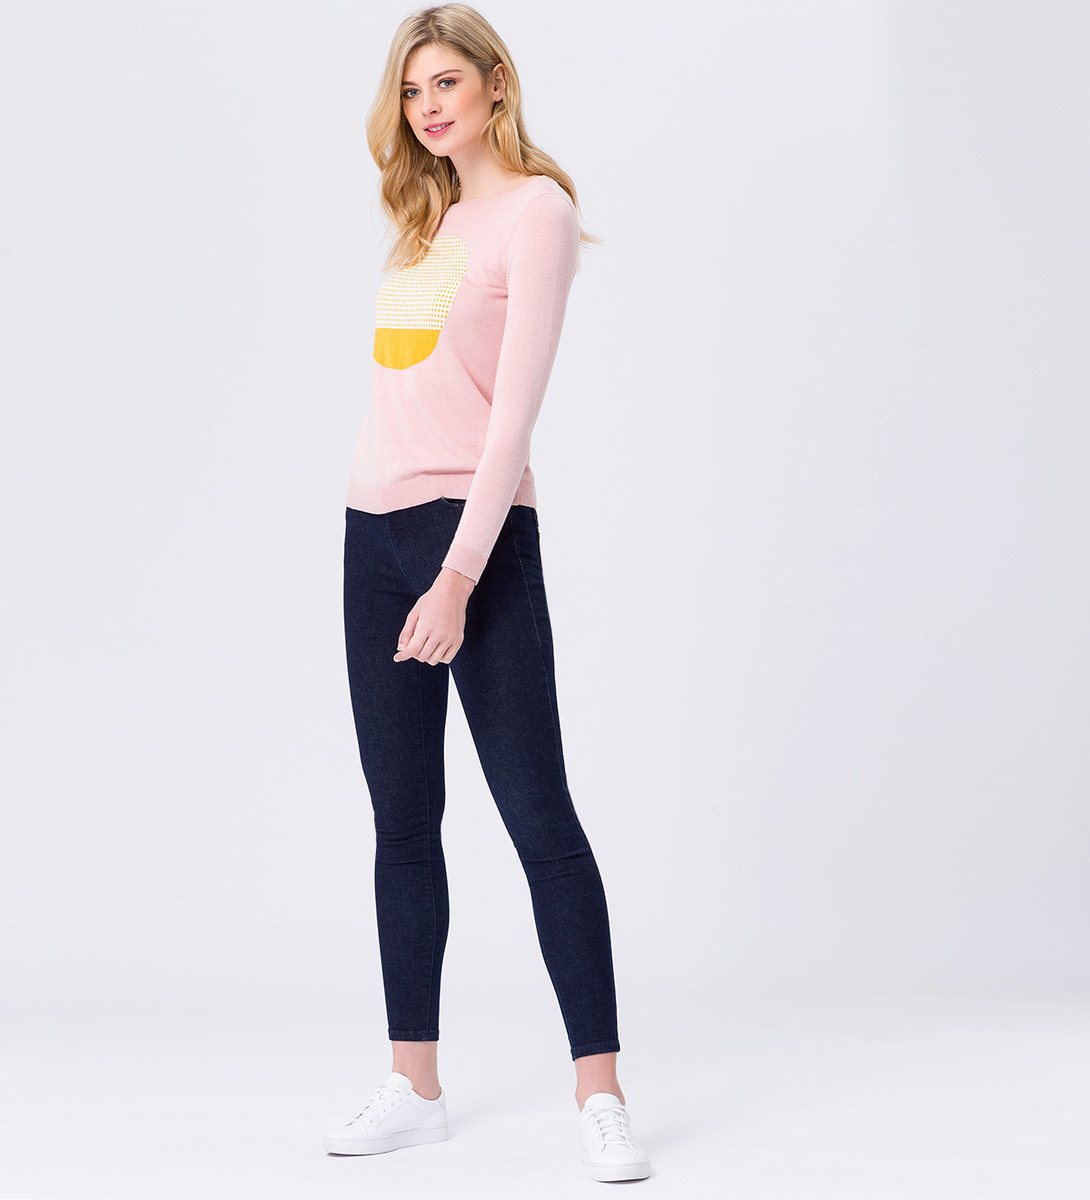 Pullover mit Muster vorn in rose parfait